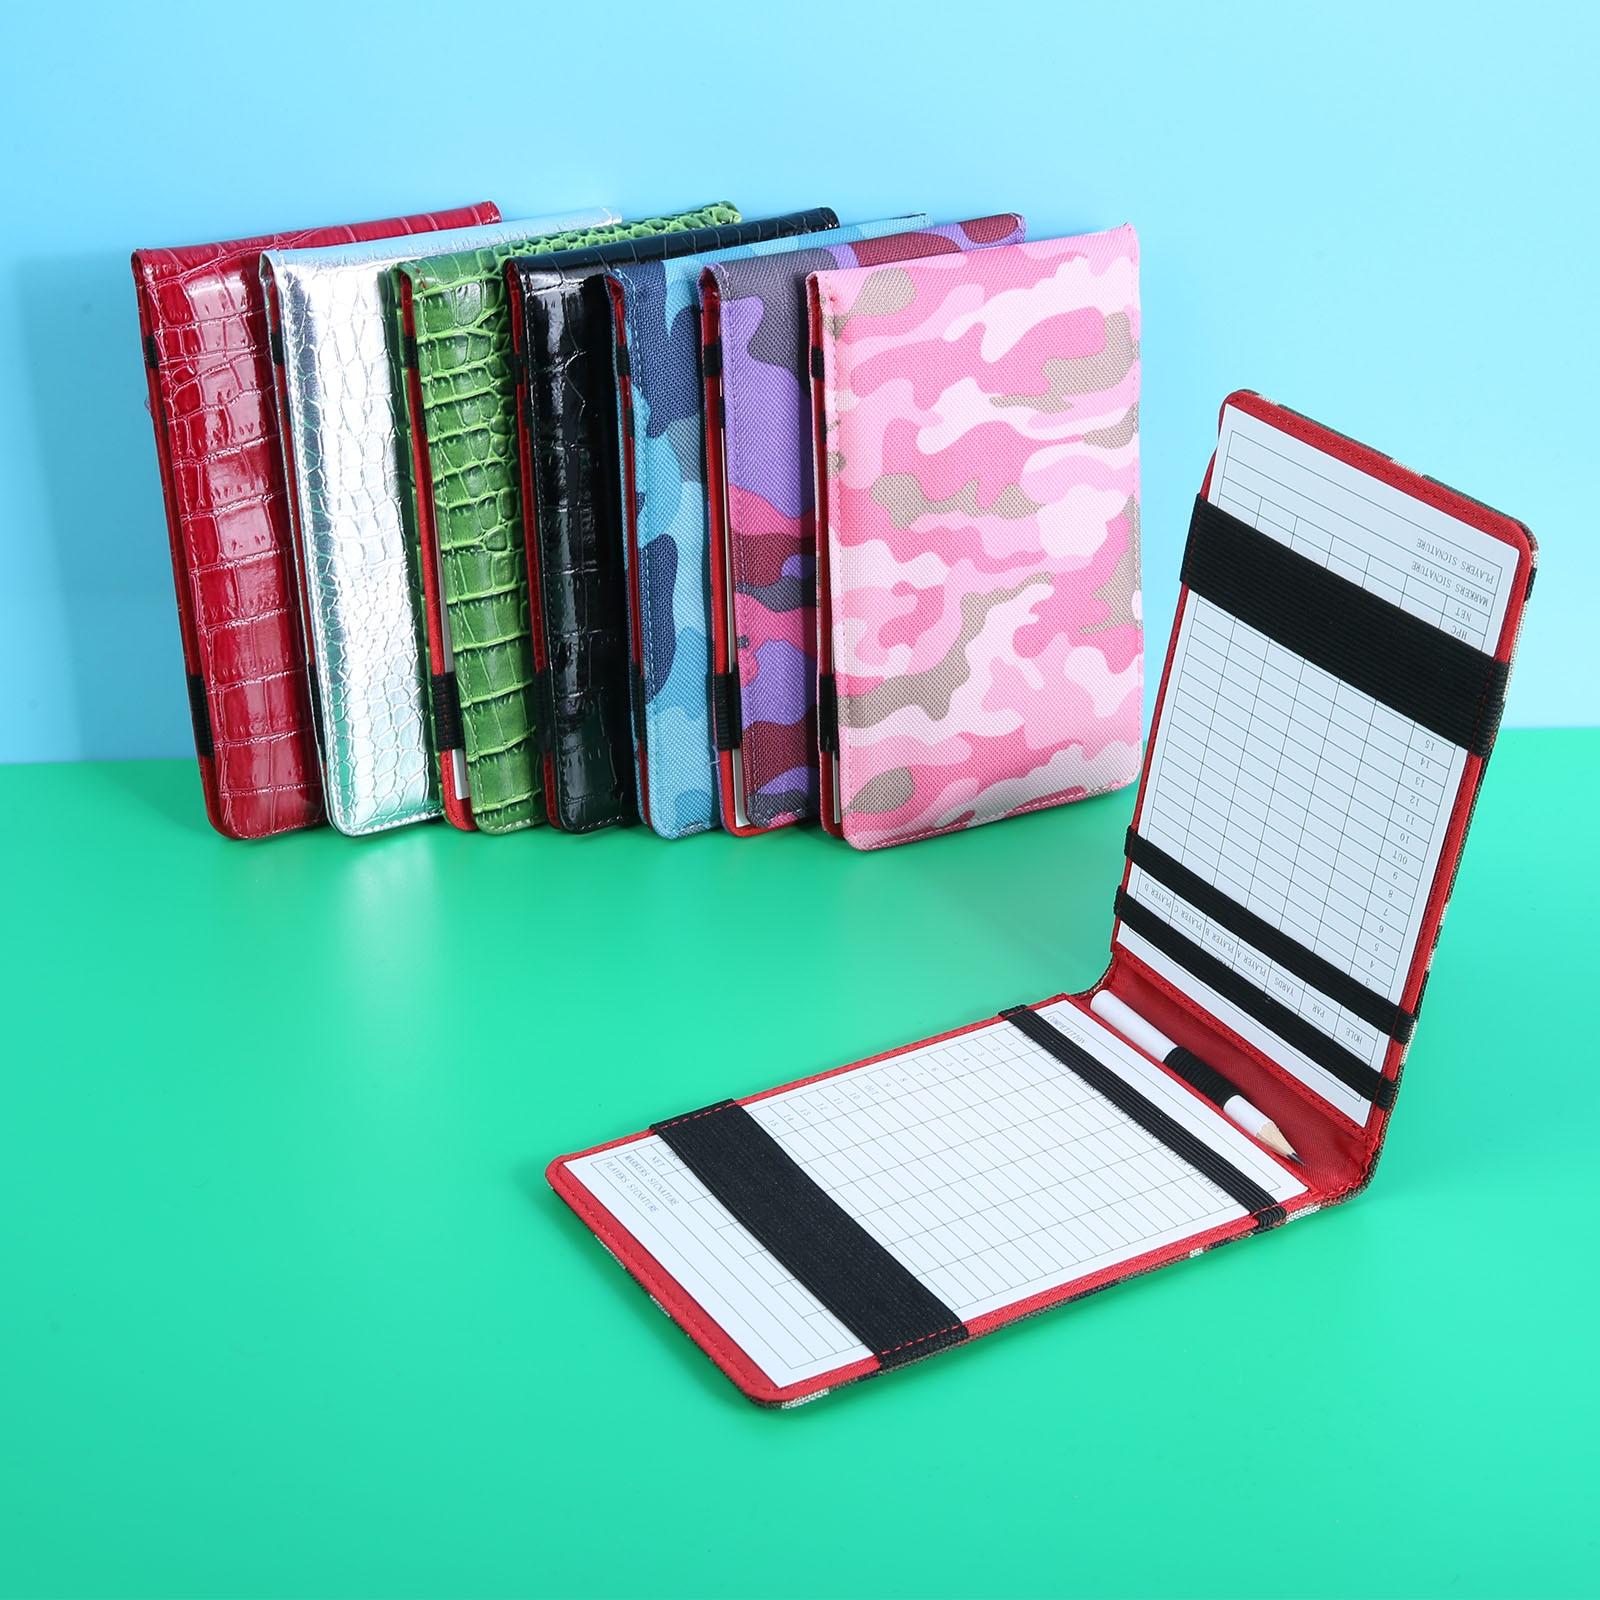 1 Pc PU Leather Golf Scorecard Holder Training Notebook Performance Golf Score Bookkeeper Cover & 2pcs Score Cards & 1 Pc Pencil